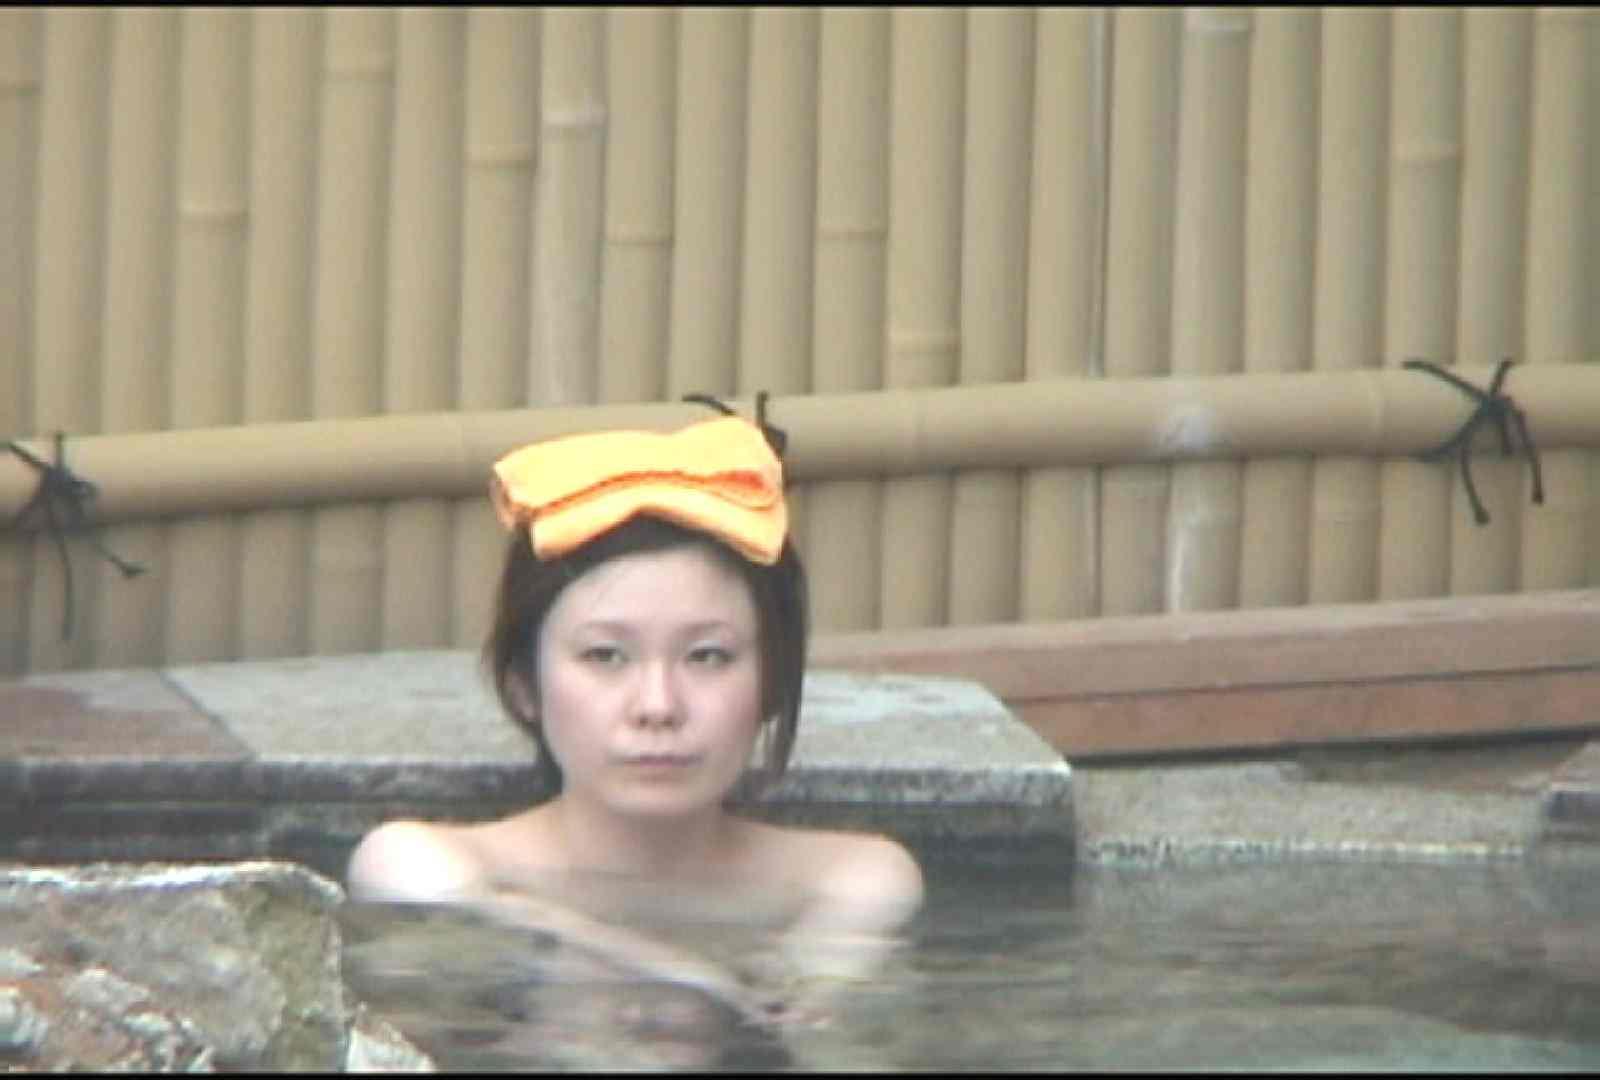 Aquaな露天風呂Vol.177 綺麗なOLたち アダルト動画キャプチャ 112枚 17